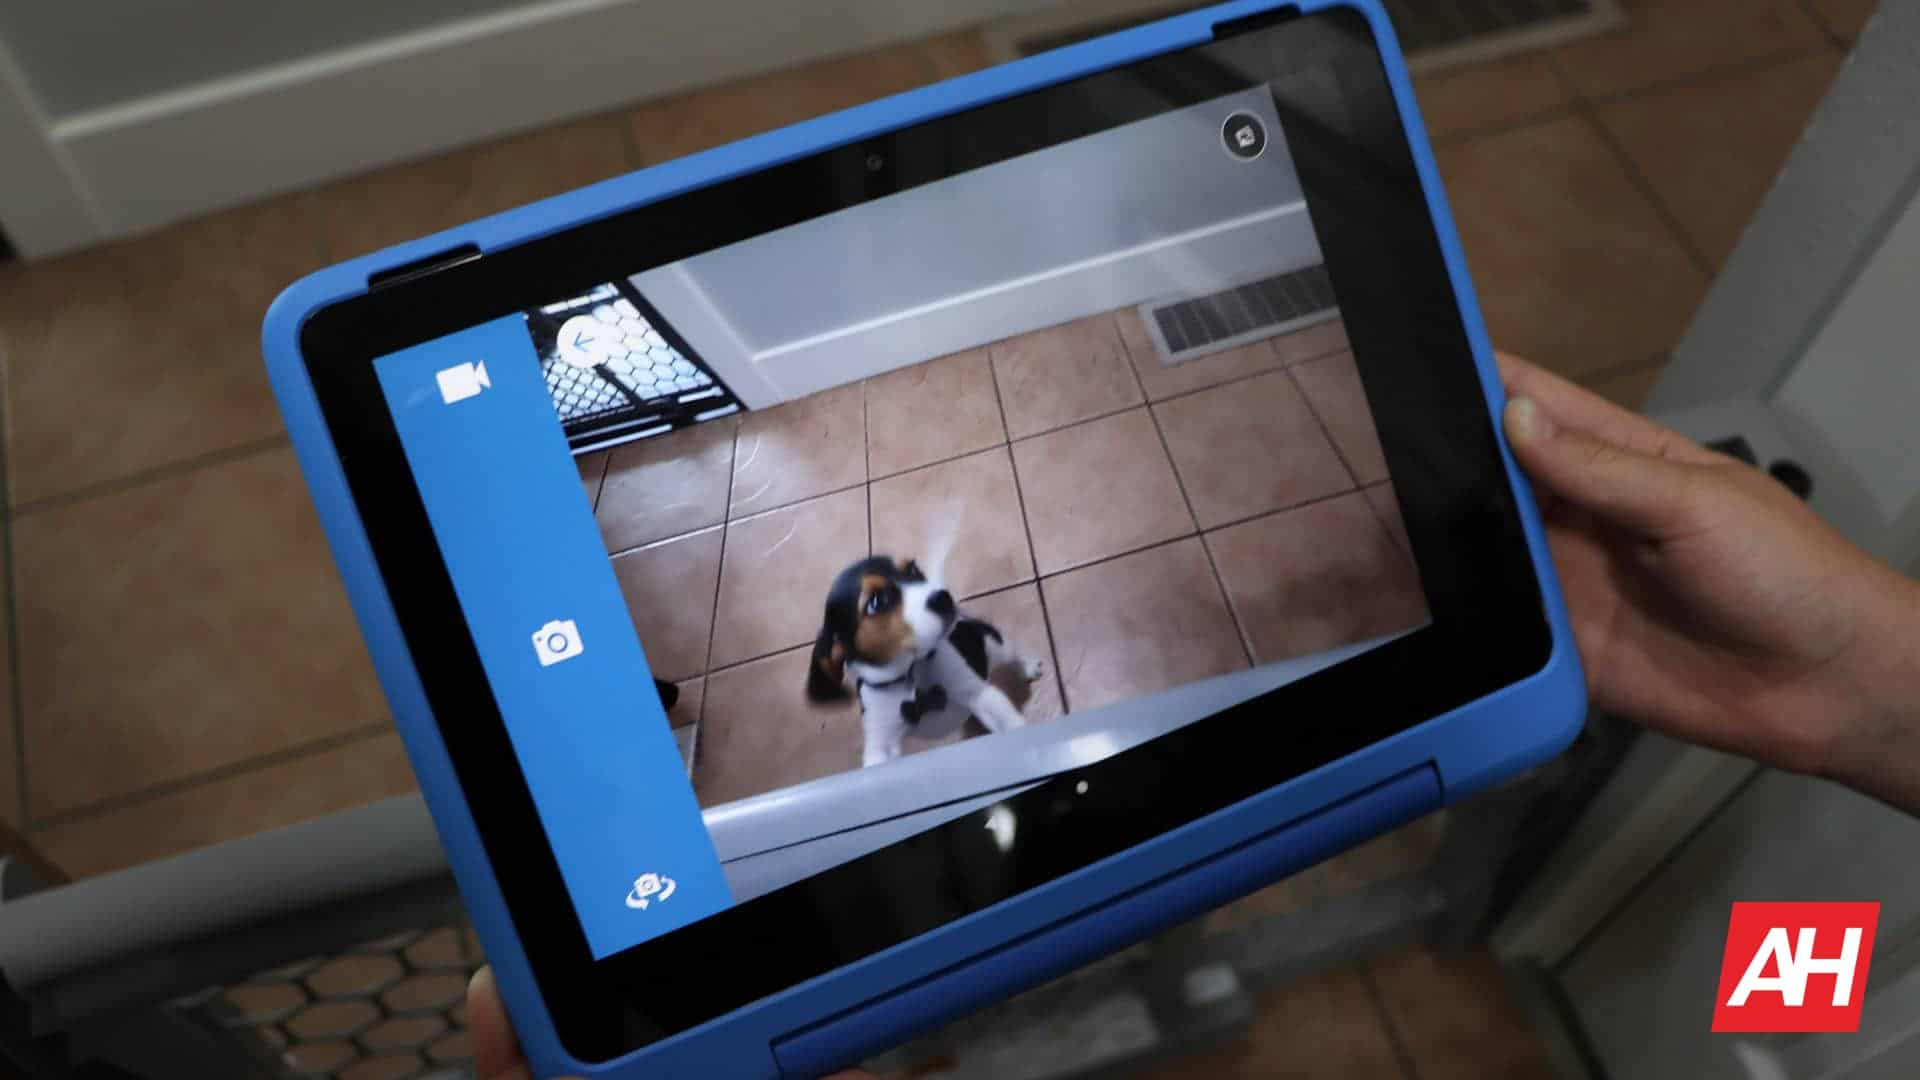 07 Amazon Fire HD 10 Kids Pro review camera DG AH 2021